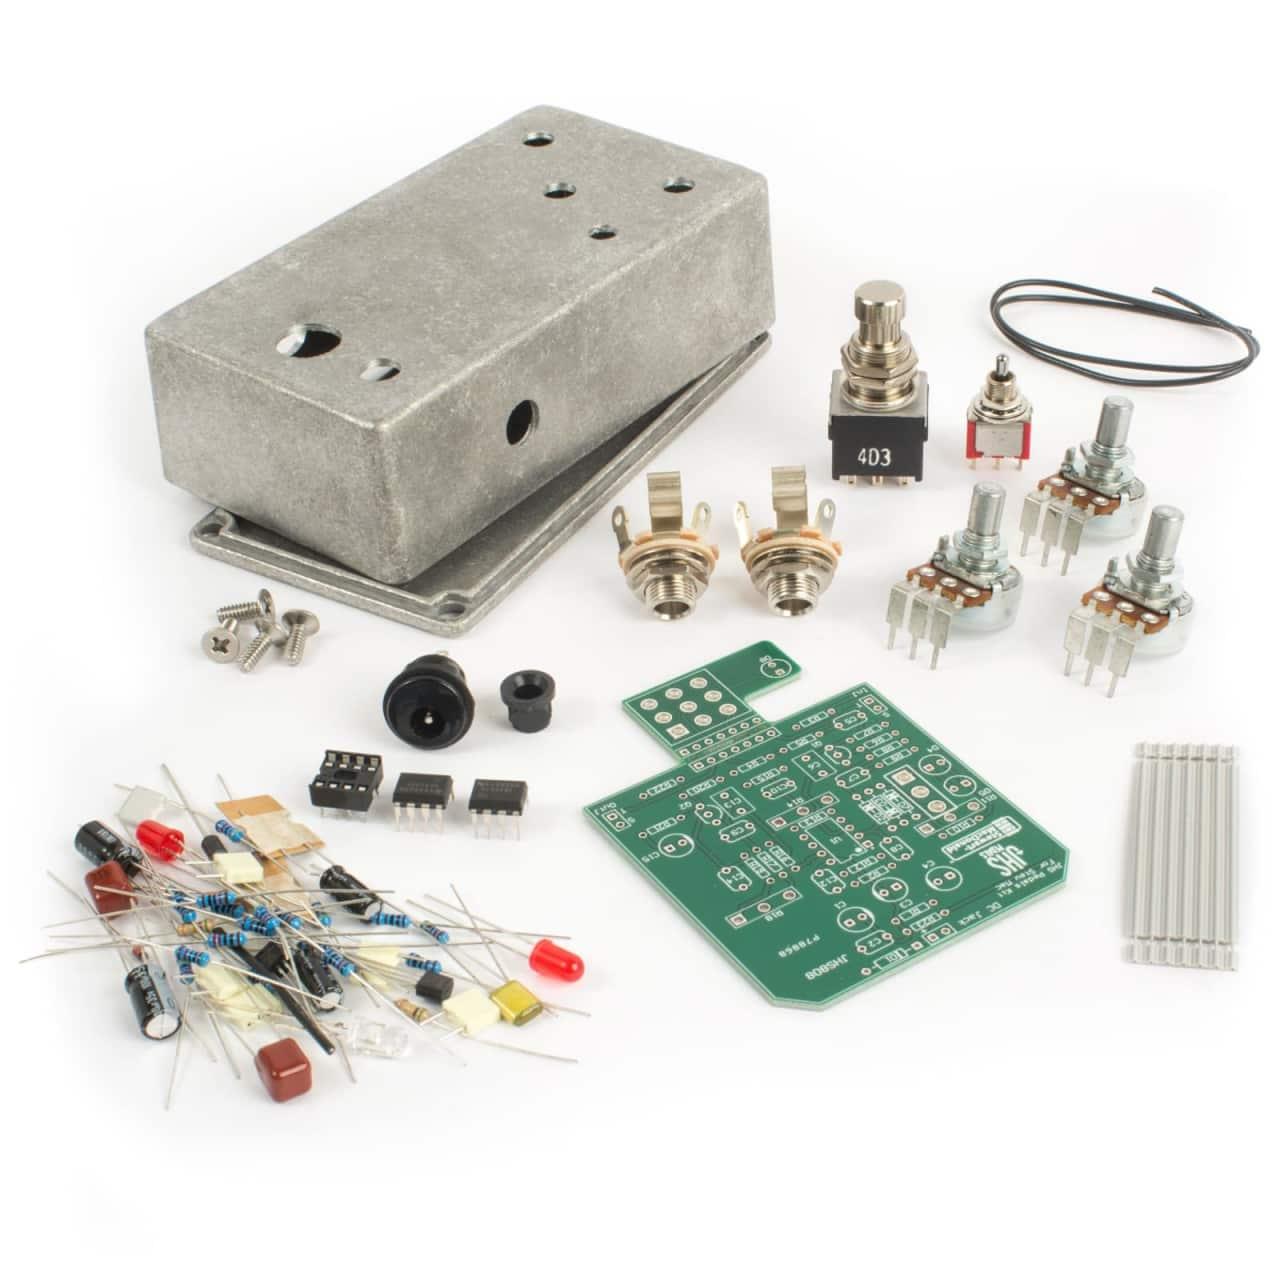 stewmac jhs 808 overdrive pedal kit reverb. Black Bedroom Furniture Sets. Home Design Ideas